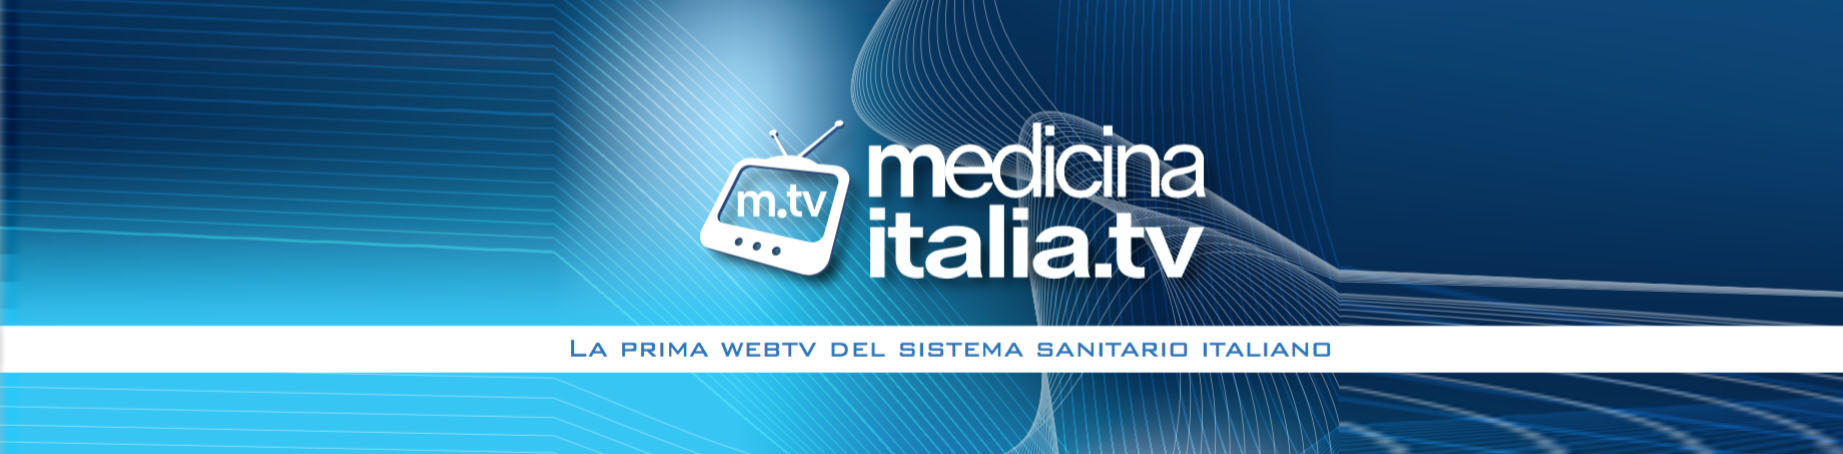 medicinaitalia-la-webtv-della-medicina-italiana